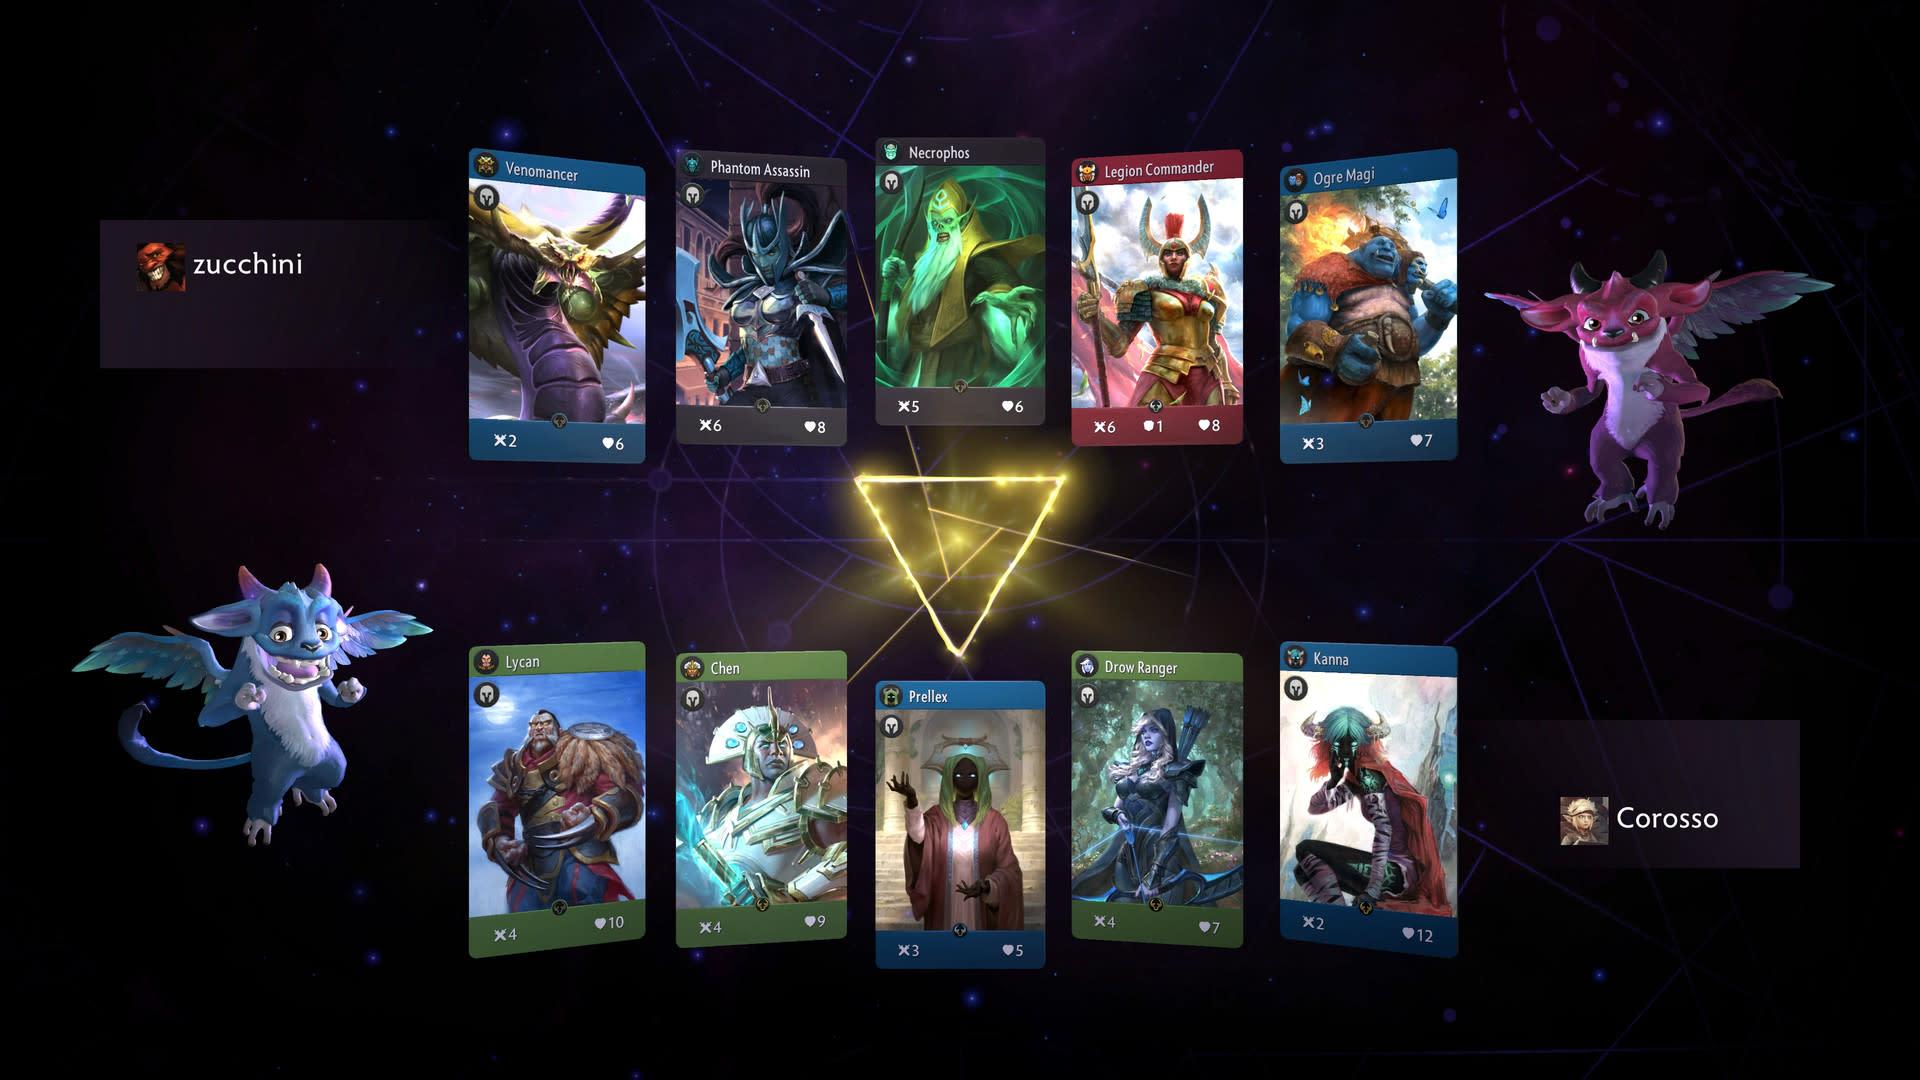 Valve halts development on 'Artifact,' makes it free for everyone | Engadget